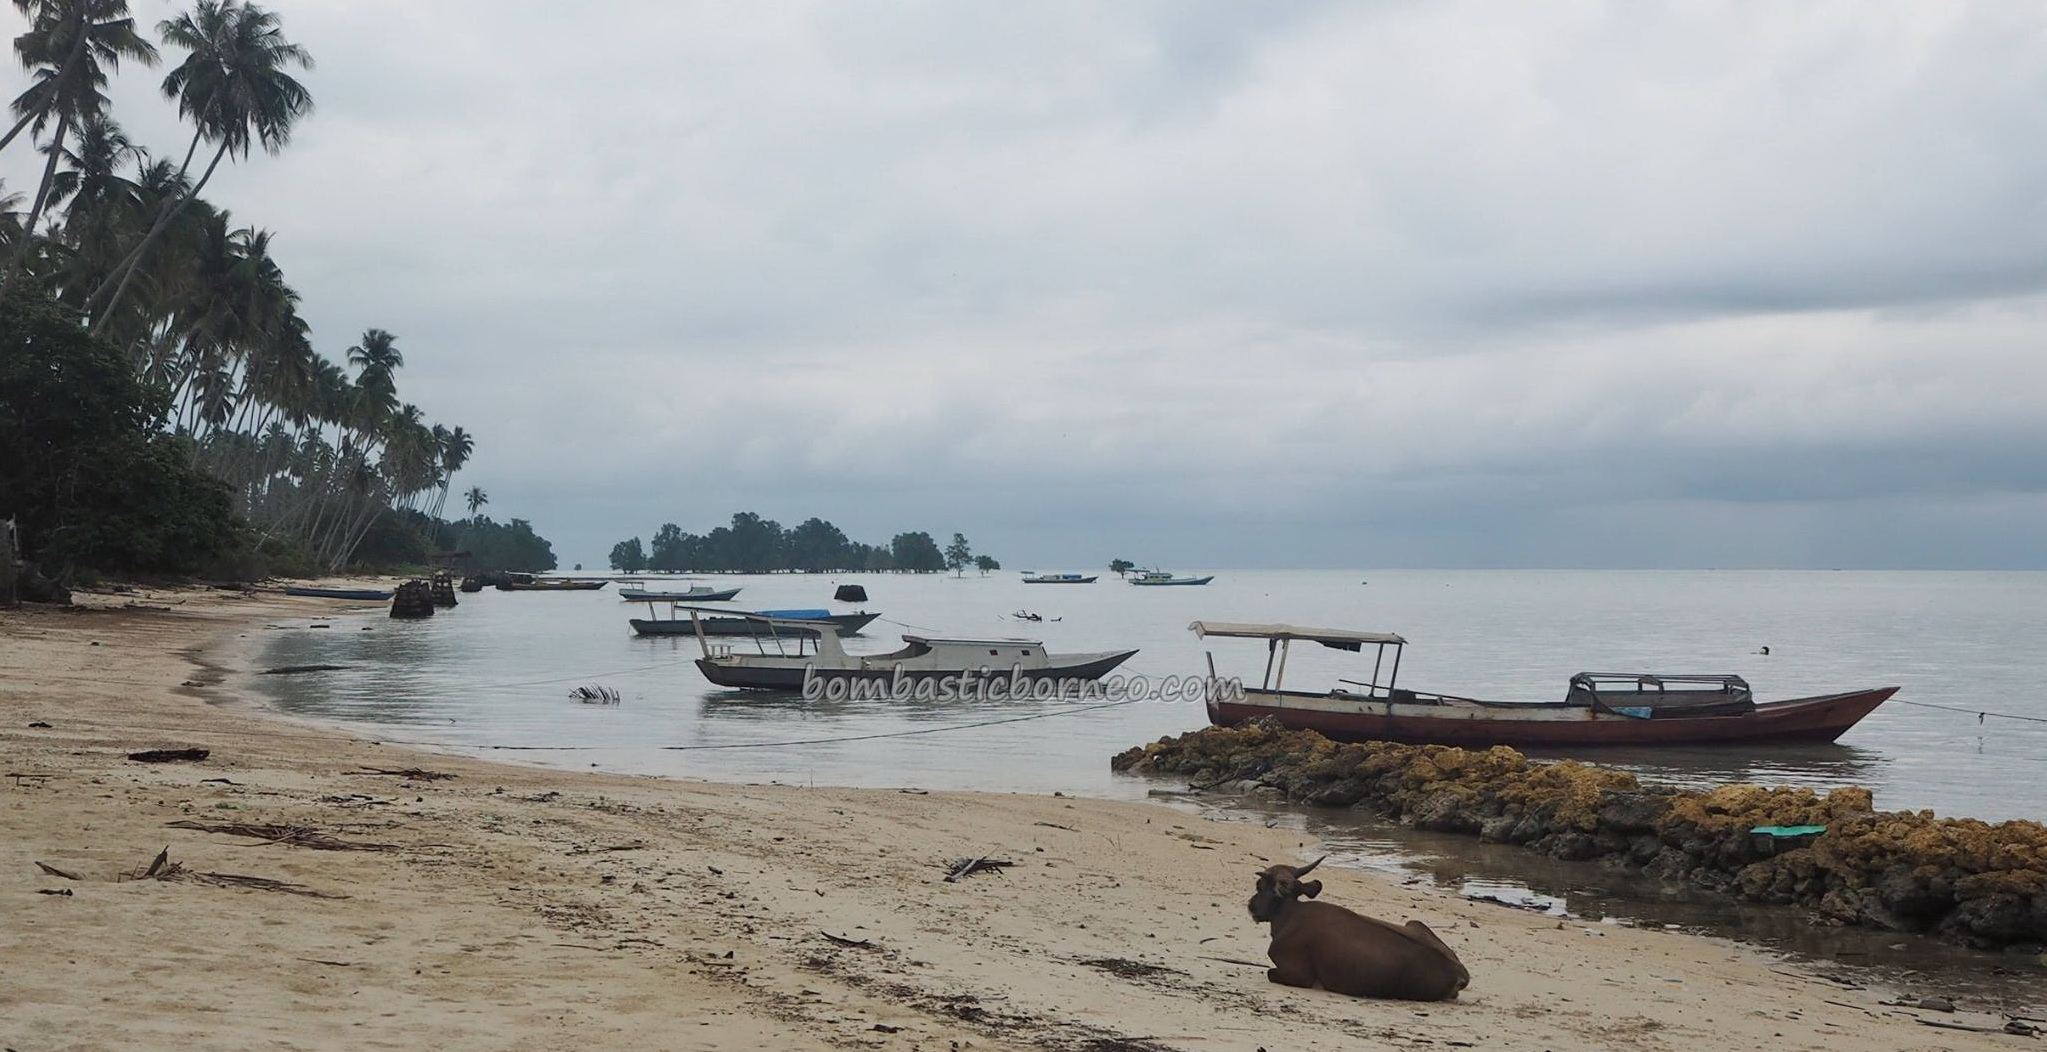 white sandy beach, fishing village, Kampung, outdoor, authentic, Berau, Indonesia, holiday, obyek wisata, Tourism, tourist attraction, travel guide, transborder, 婆罗洲, 旅游景点